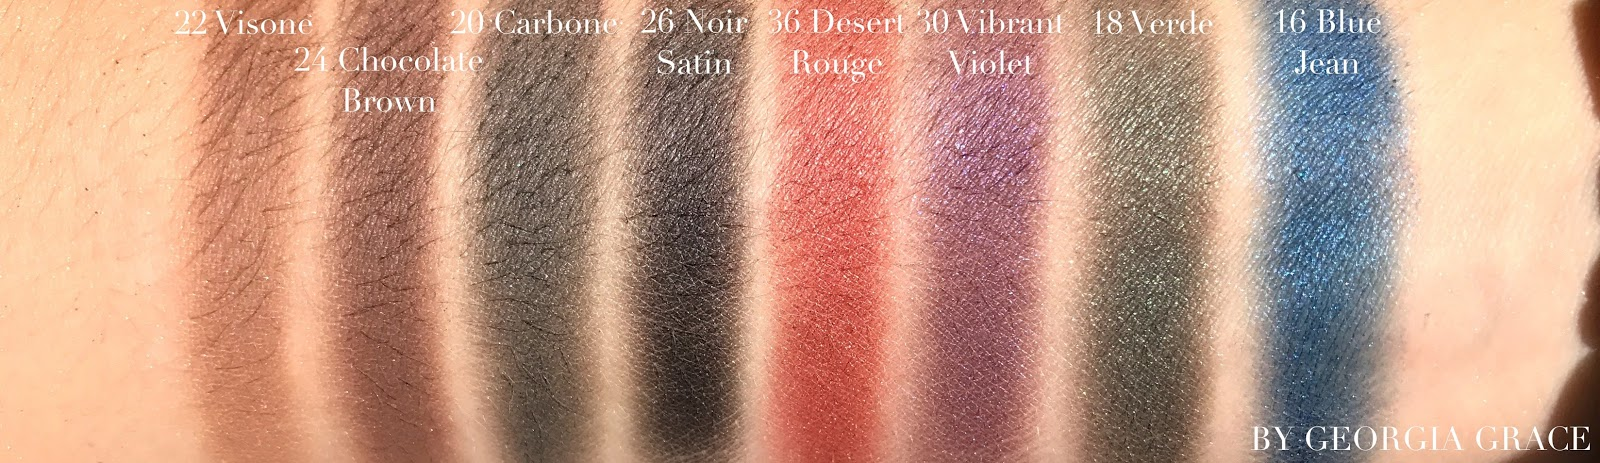 Chanel Ombre Premiere Longwear Powder Eyeshadow by Chanel #4